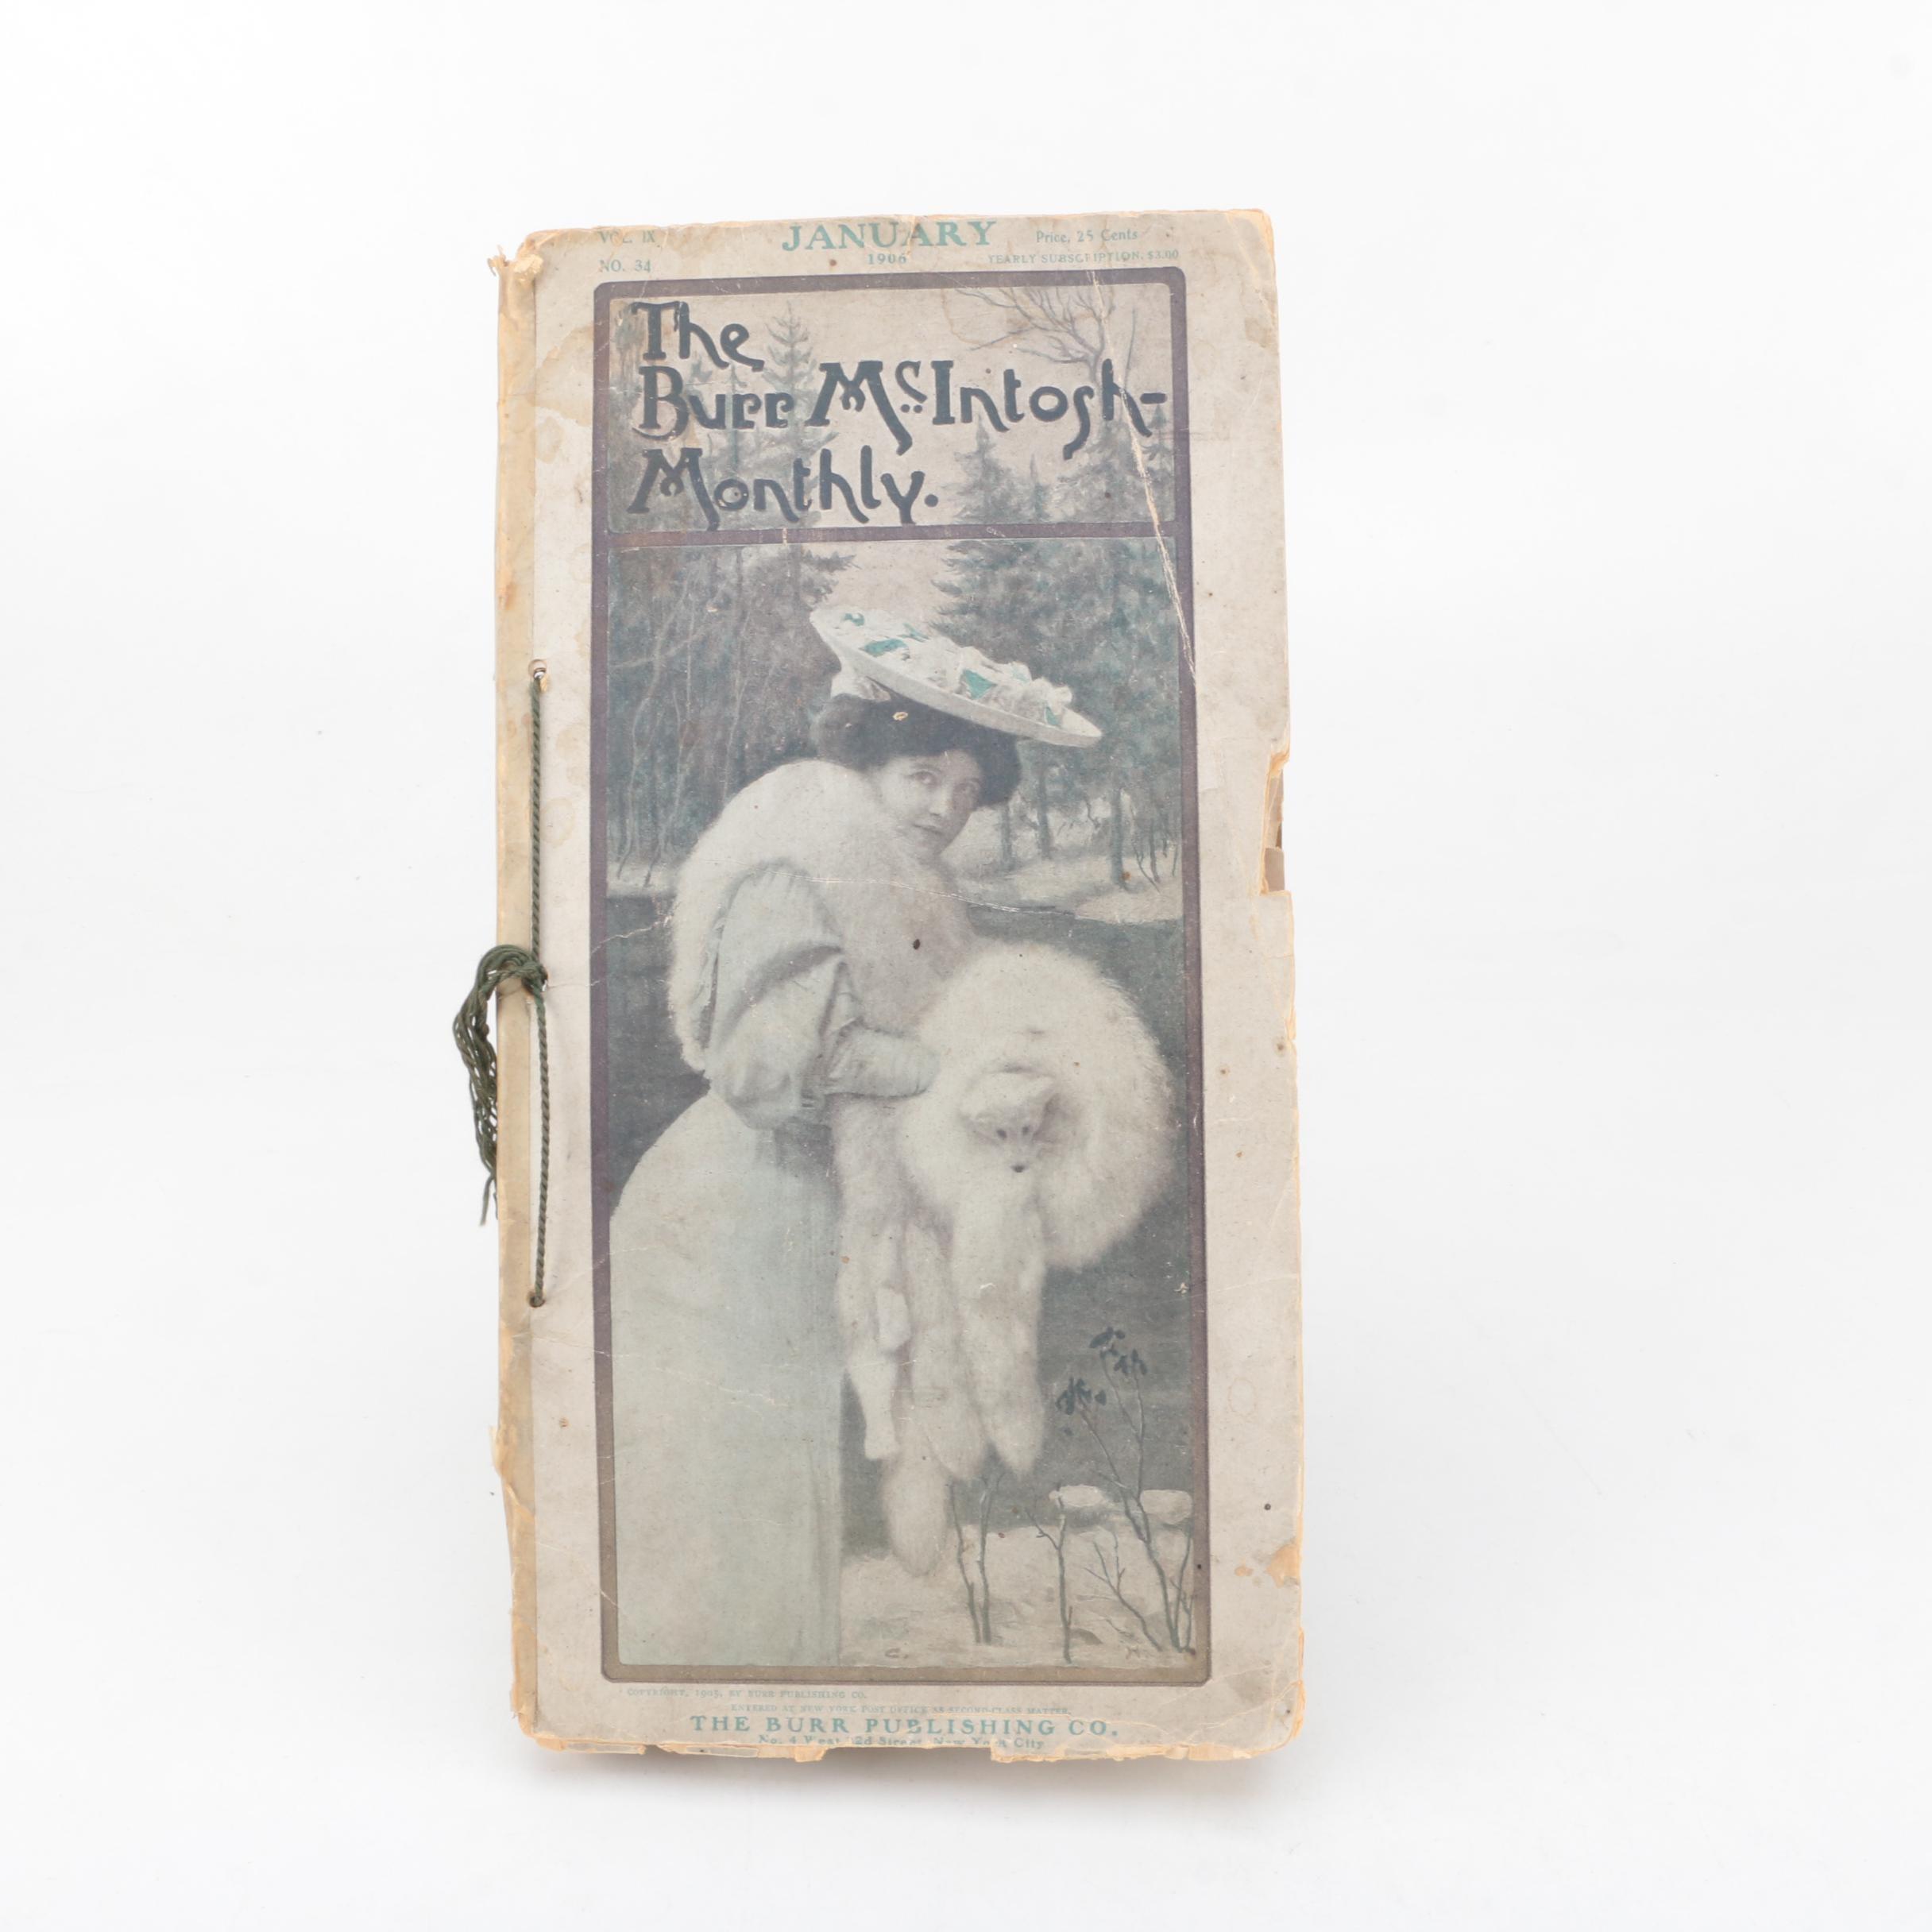 "January 1906 ""The Burr McIntosh Monthly"" Magazine"